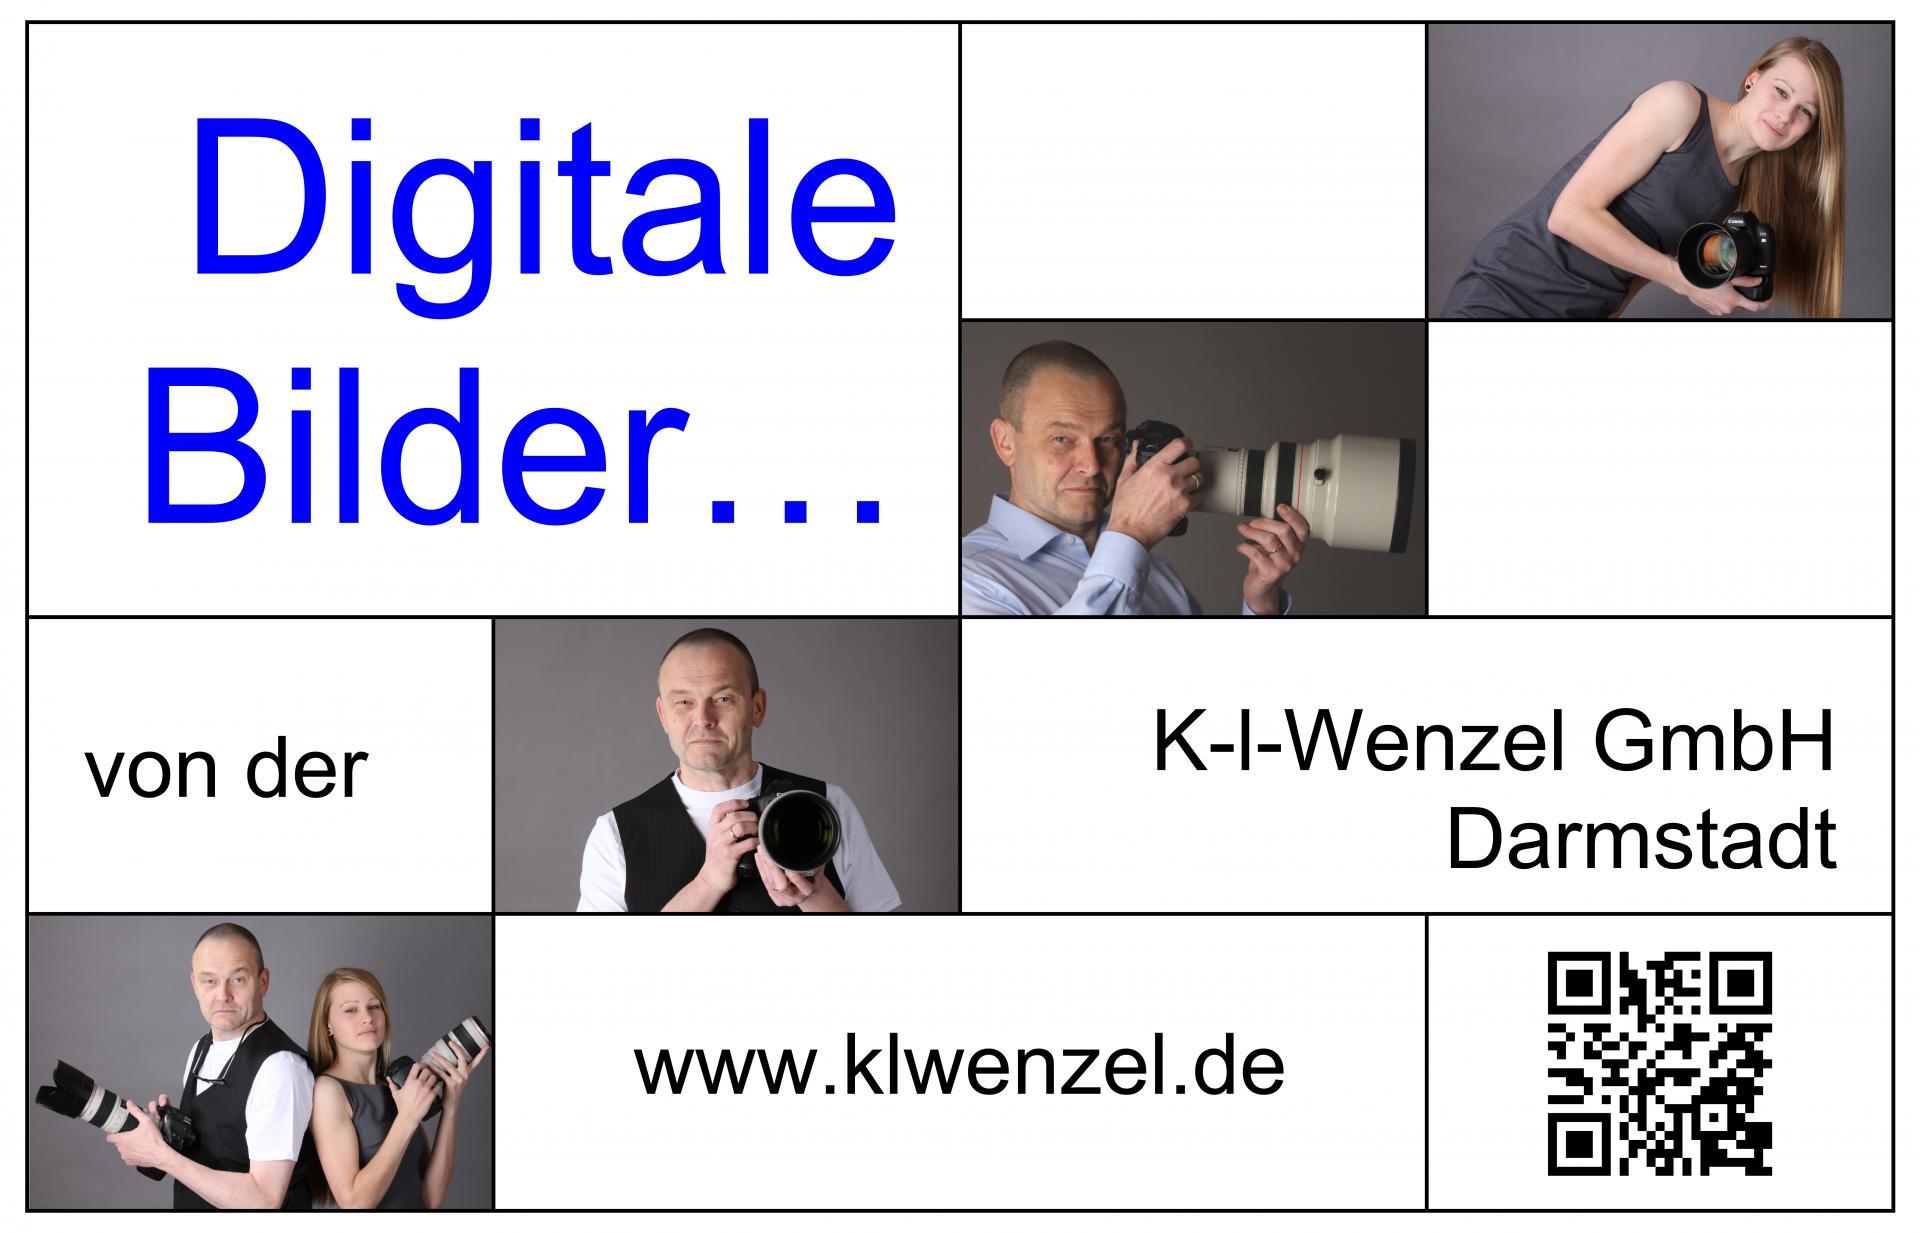 Klaus Wenzel